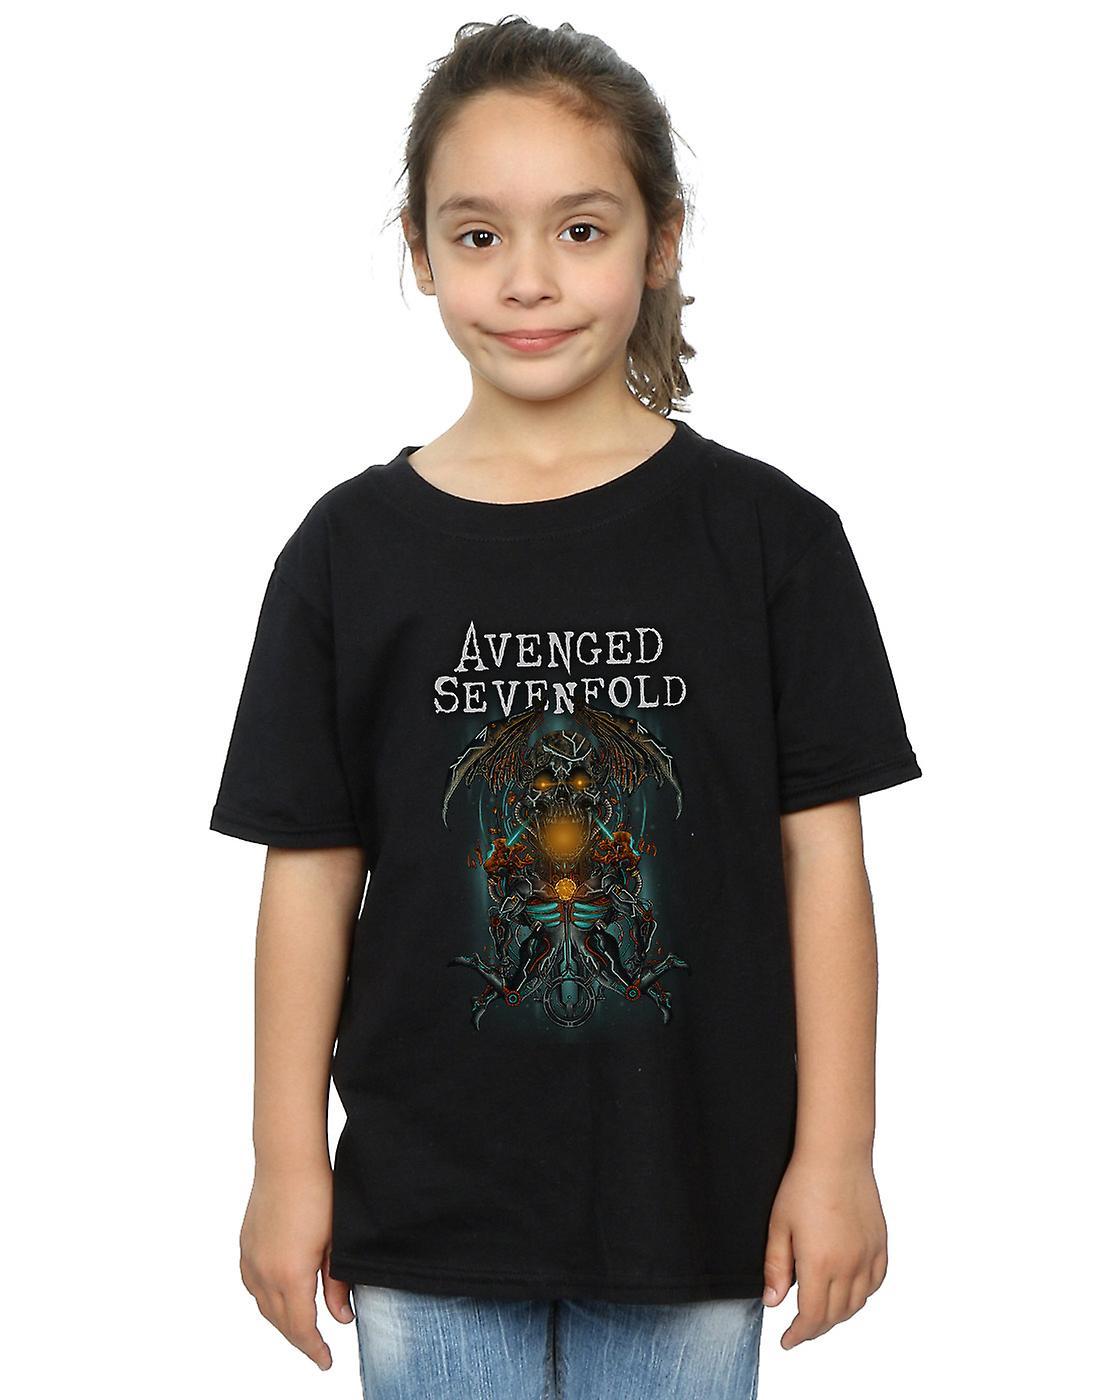 Avenged Sevenfold Girls Oracle Deathbat T-Shirt